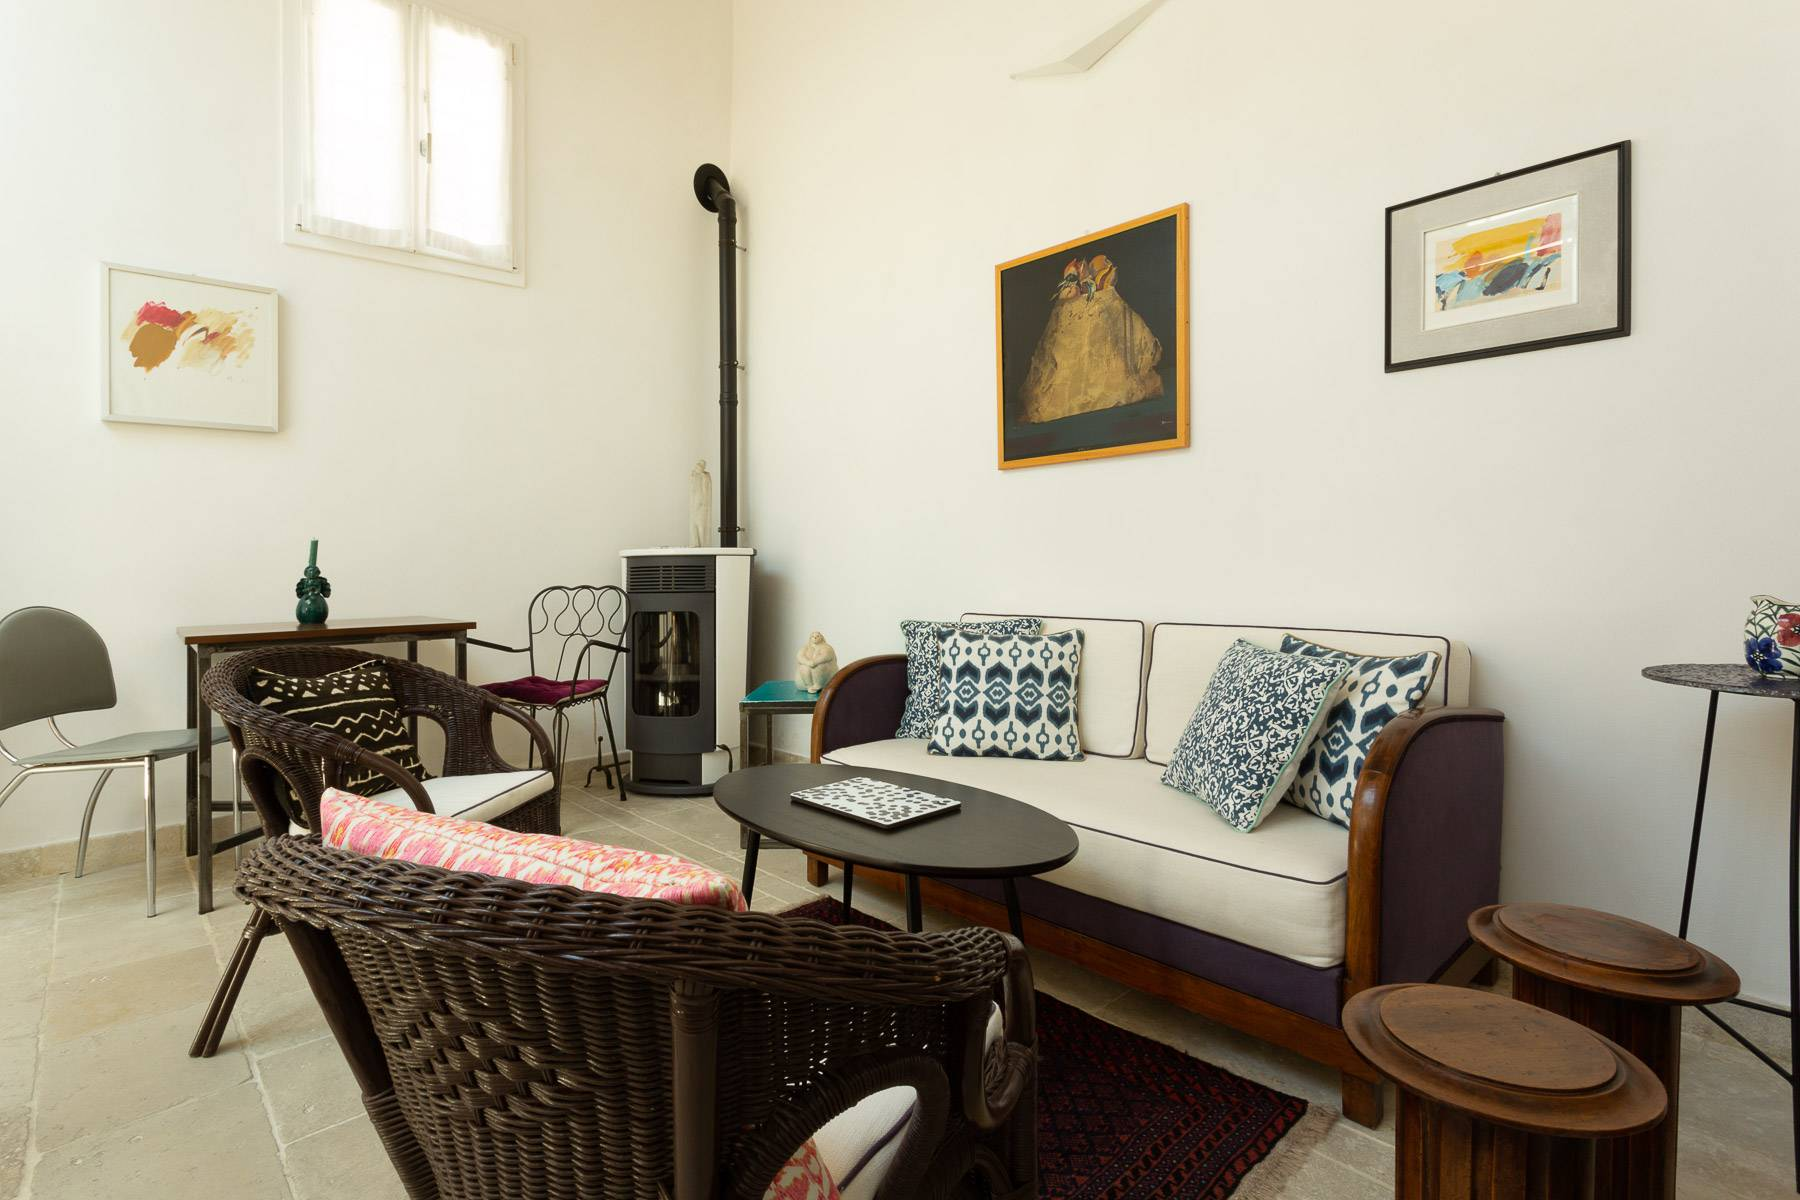 Casa indipendente in Vendita a Noto: 5 locali, 171 mq - Foto 5